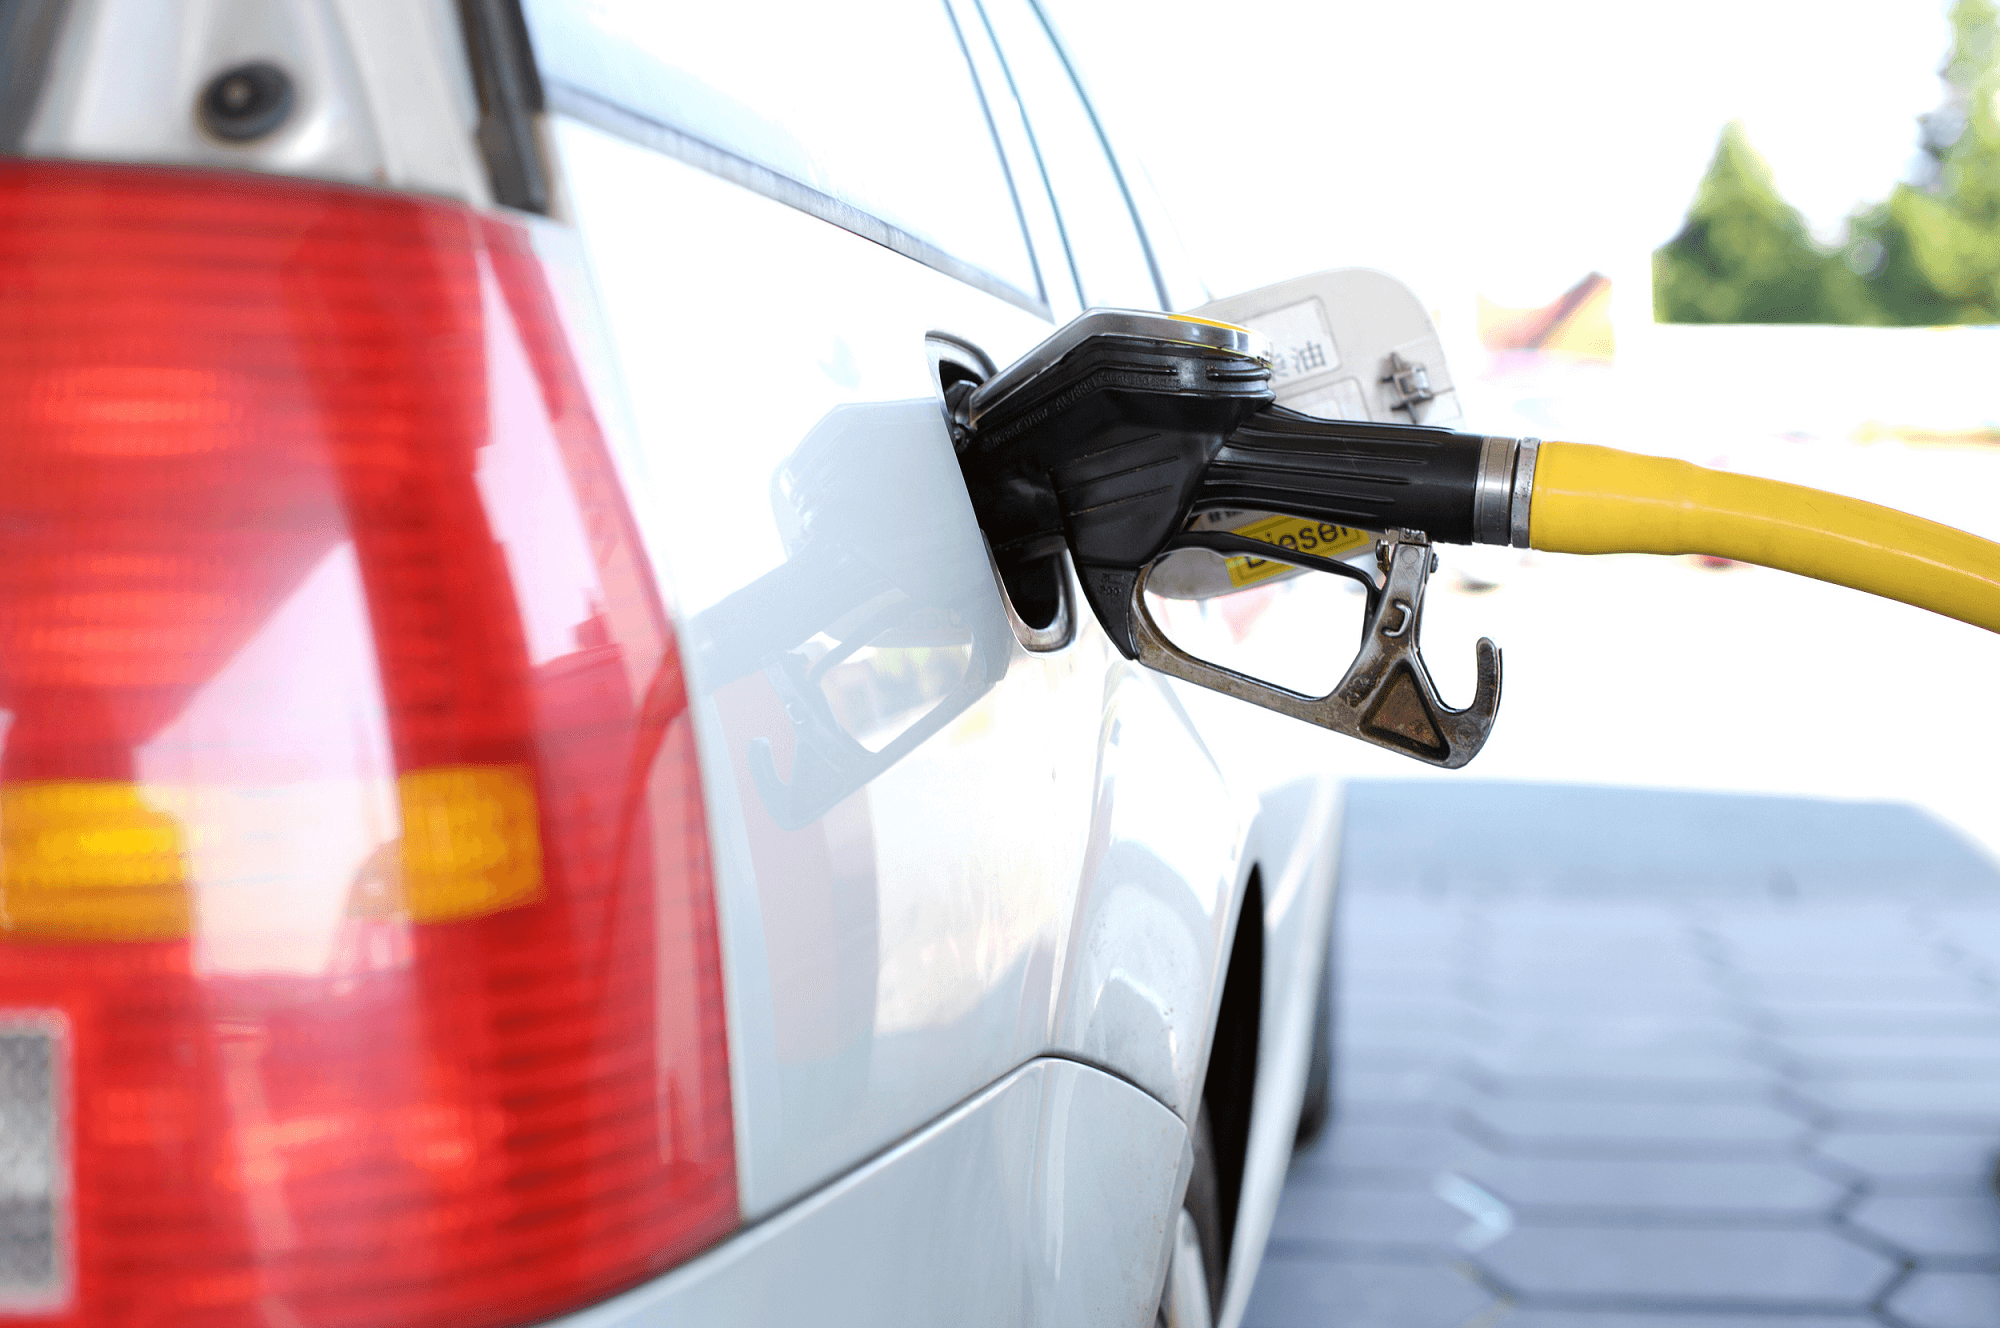 AVIA Marees maakt brandstofmanagement datagedreven